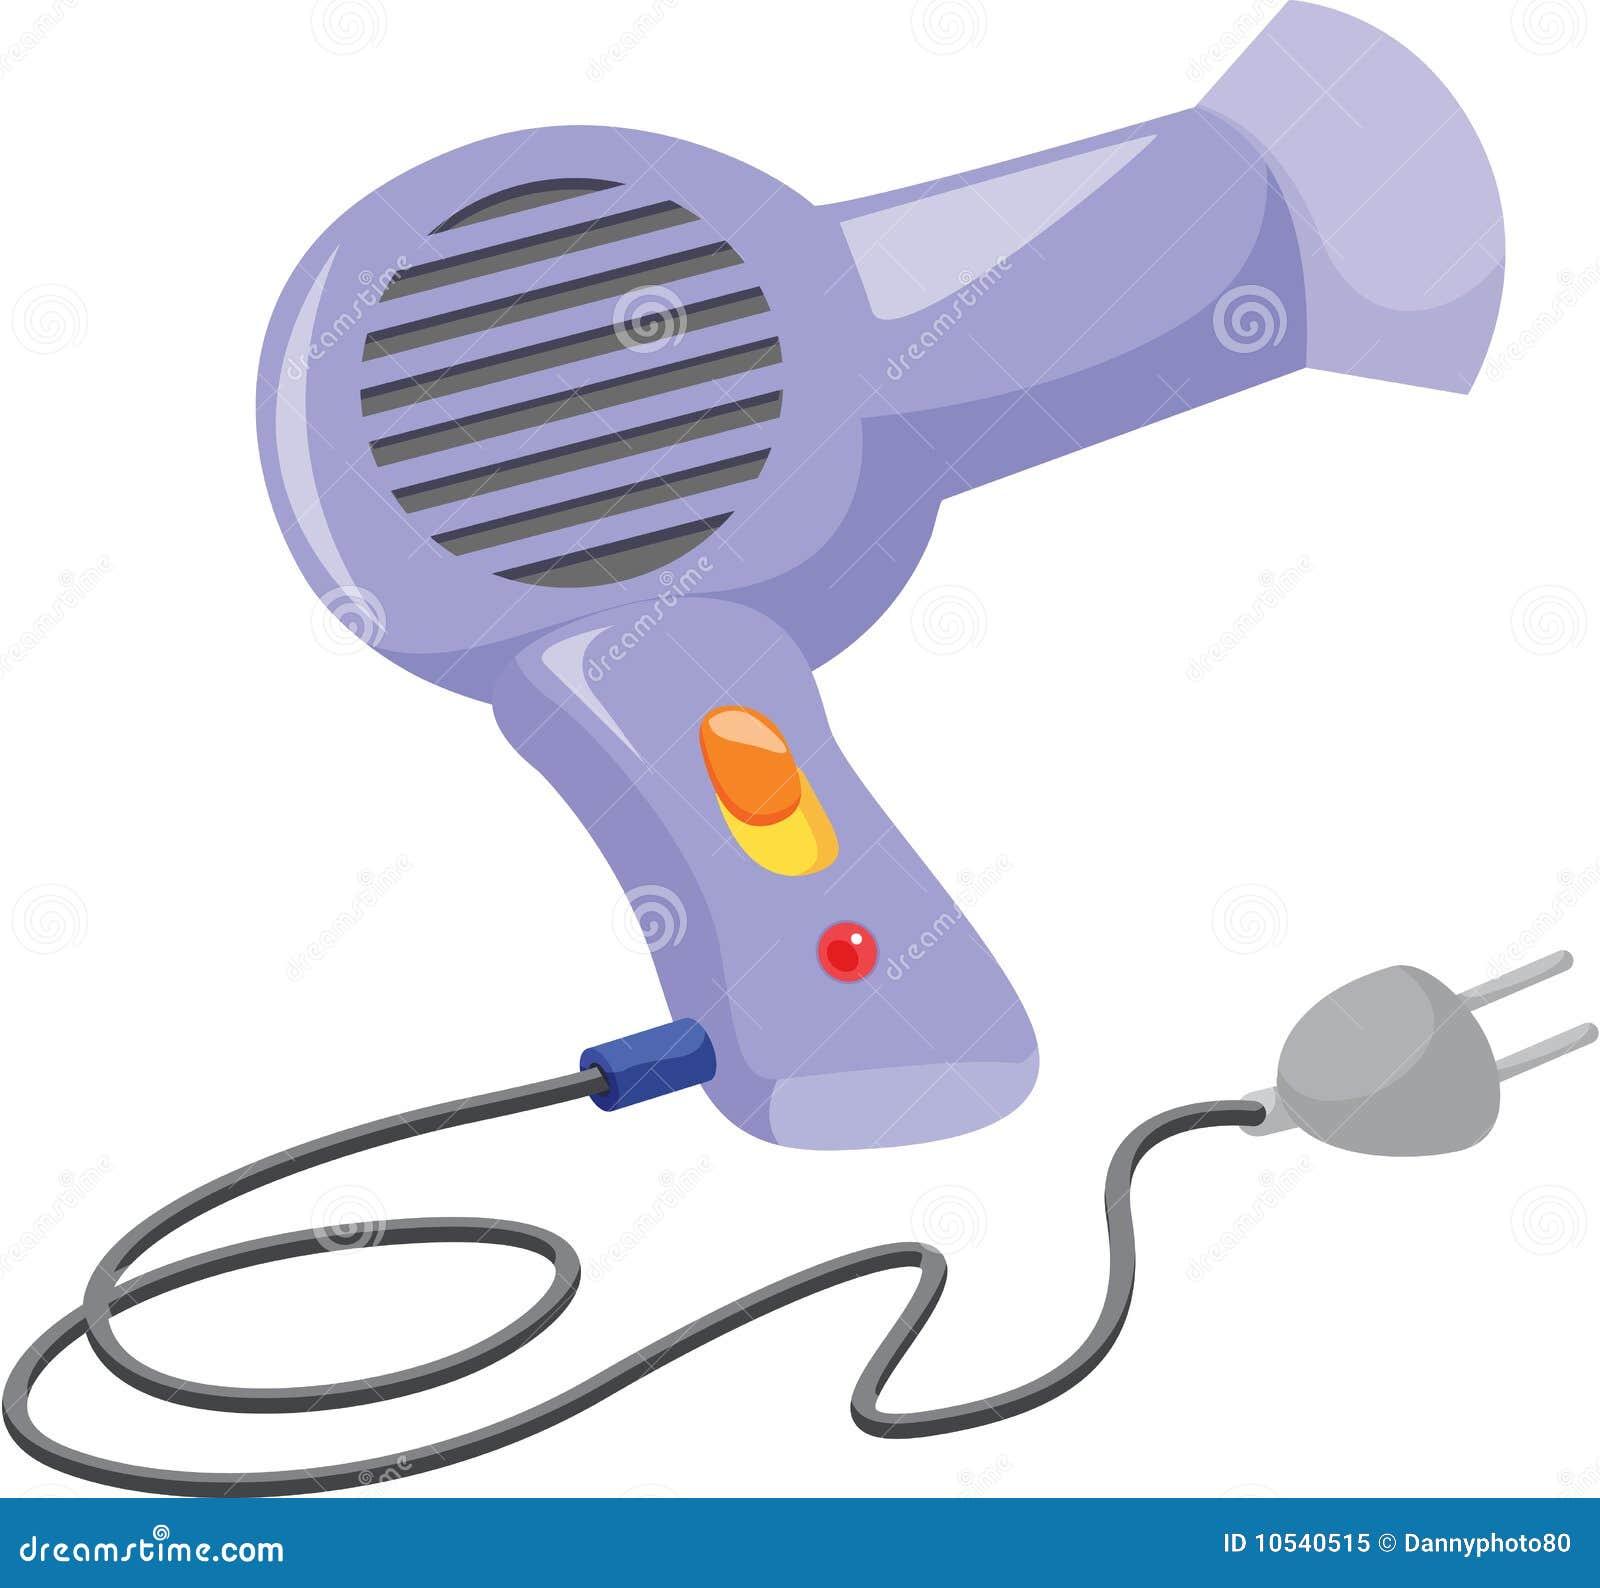 Animated Hair Dryer ~ Secador de cabelo foto stock royalty free imagem